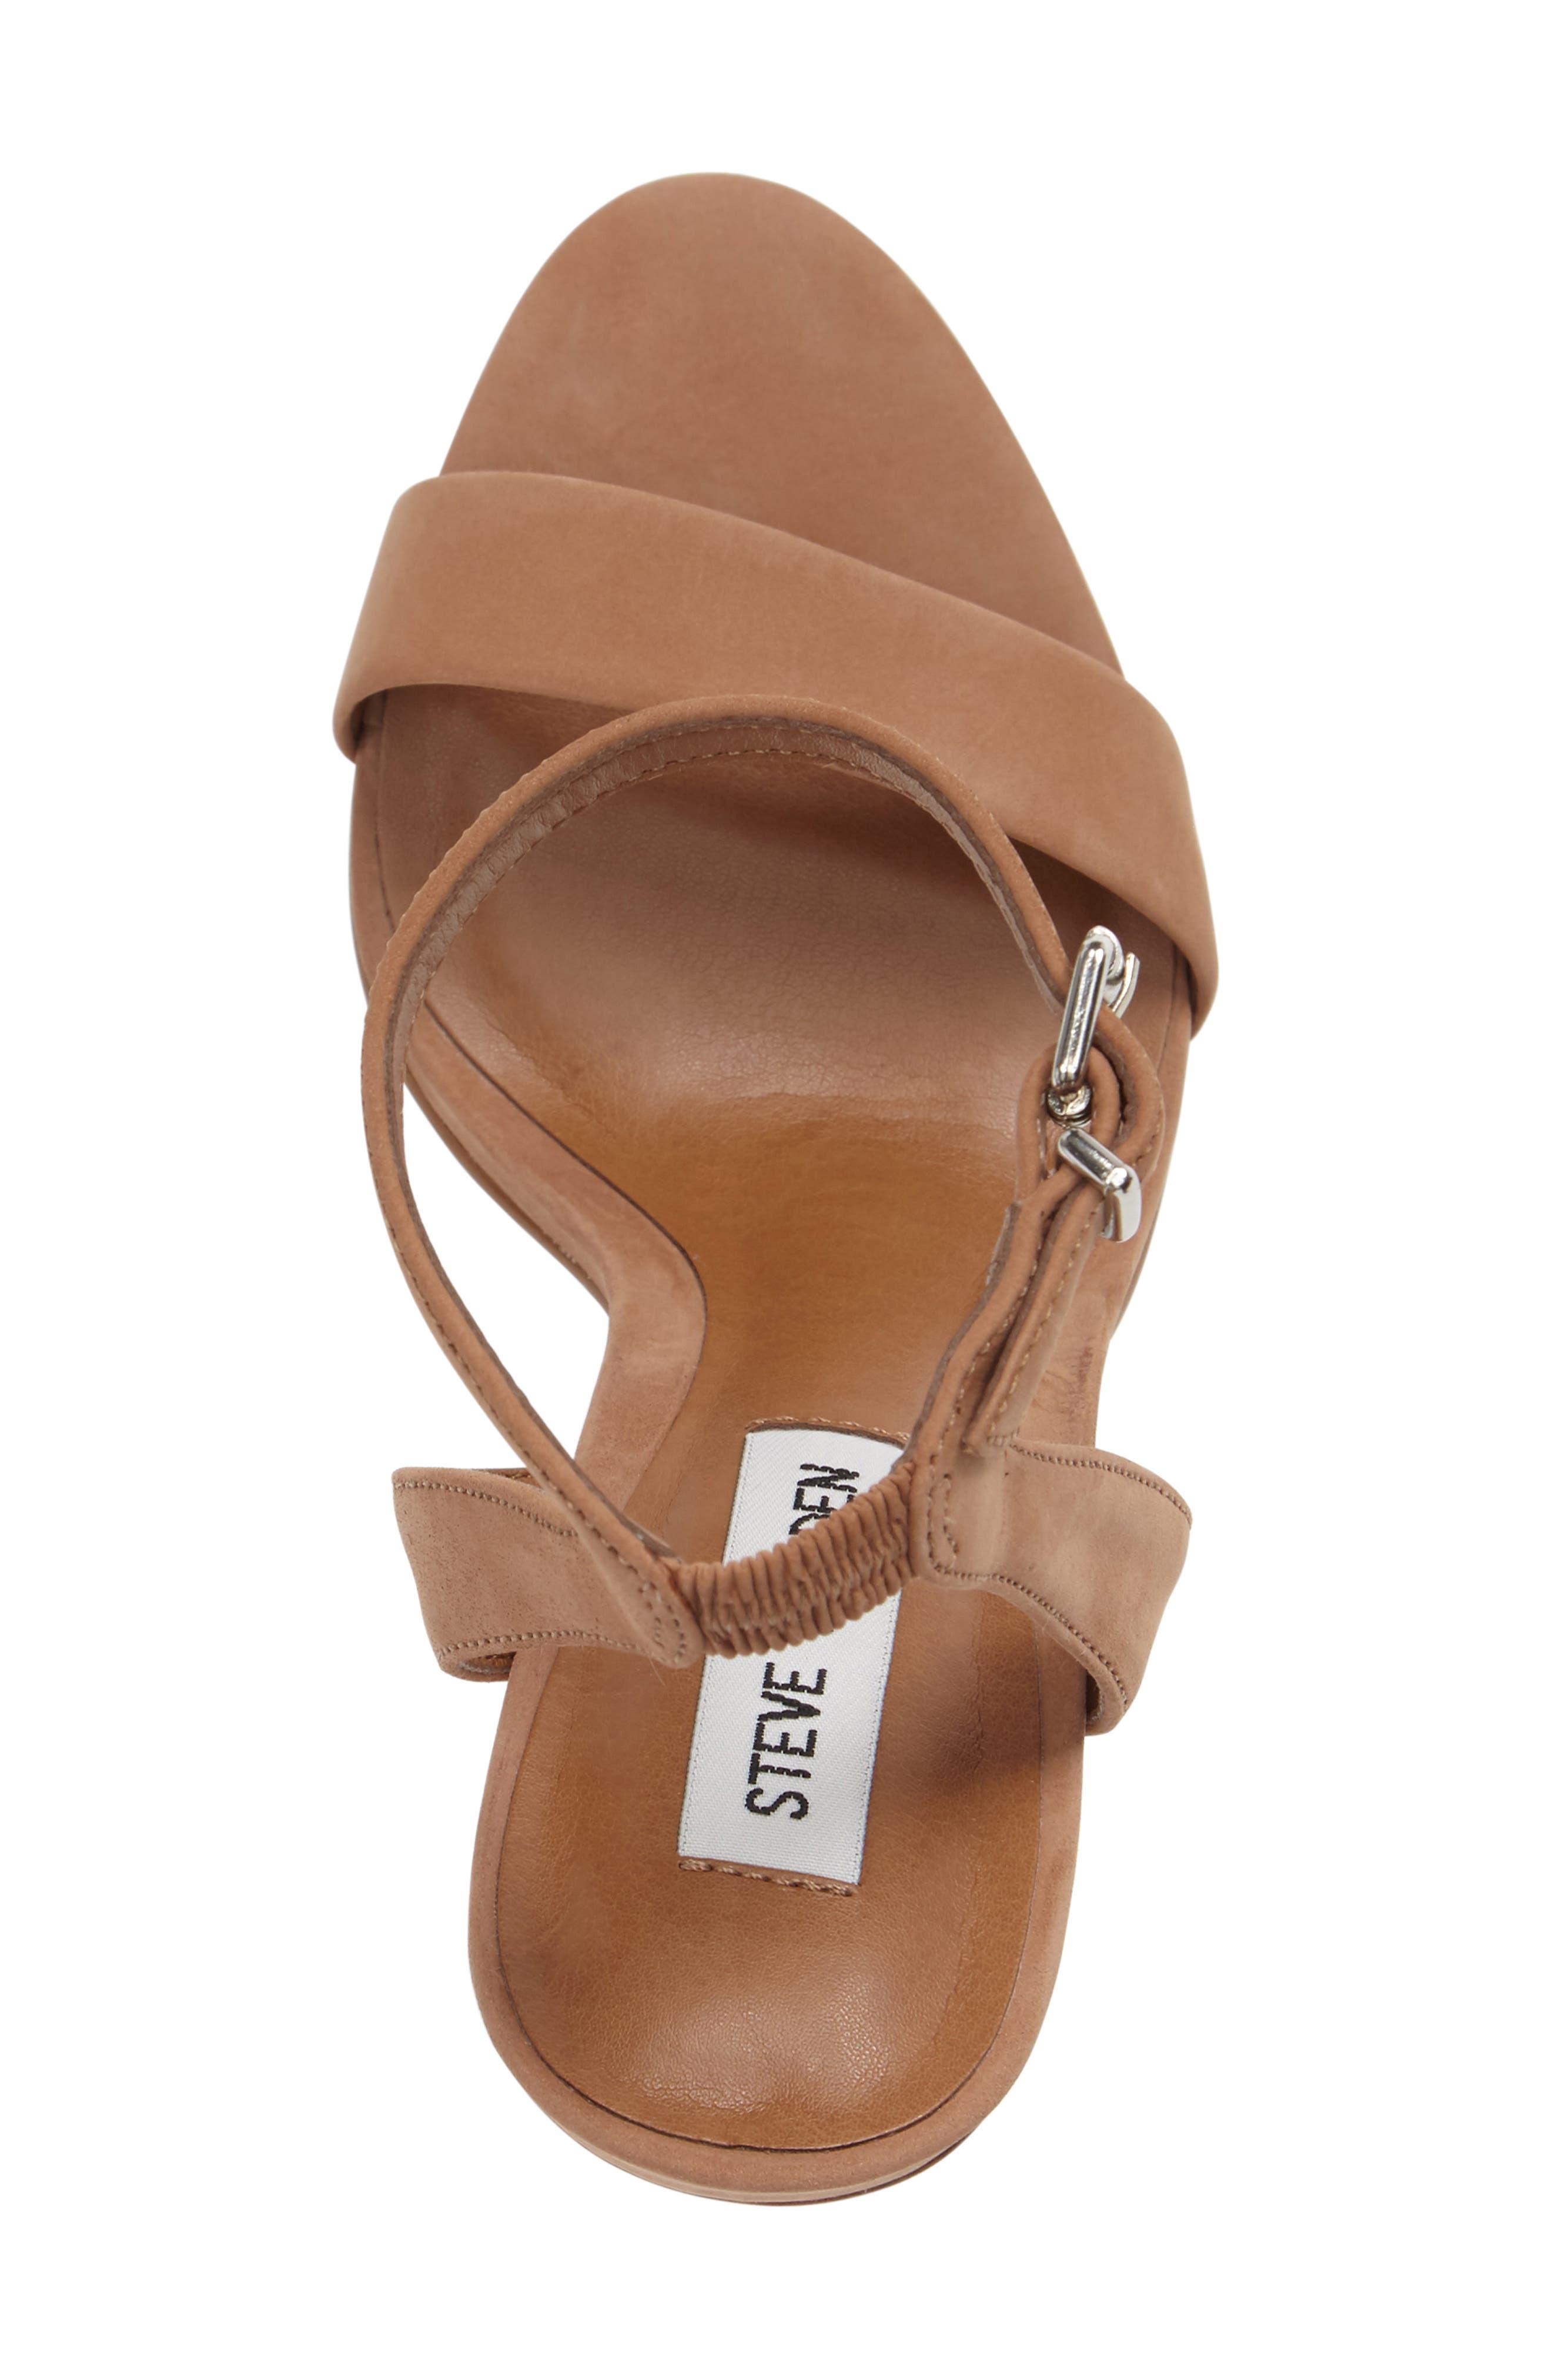 Landen Ankle Strap Sandal,                             Alternate thumbnail 45, color,